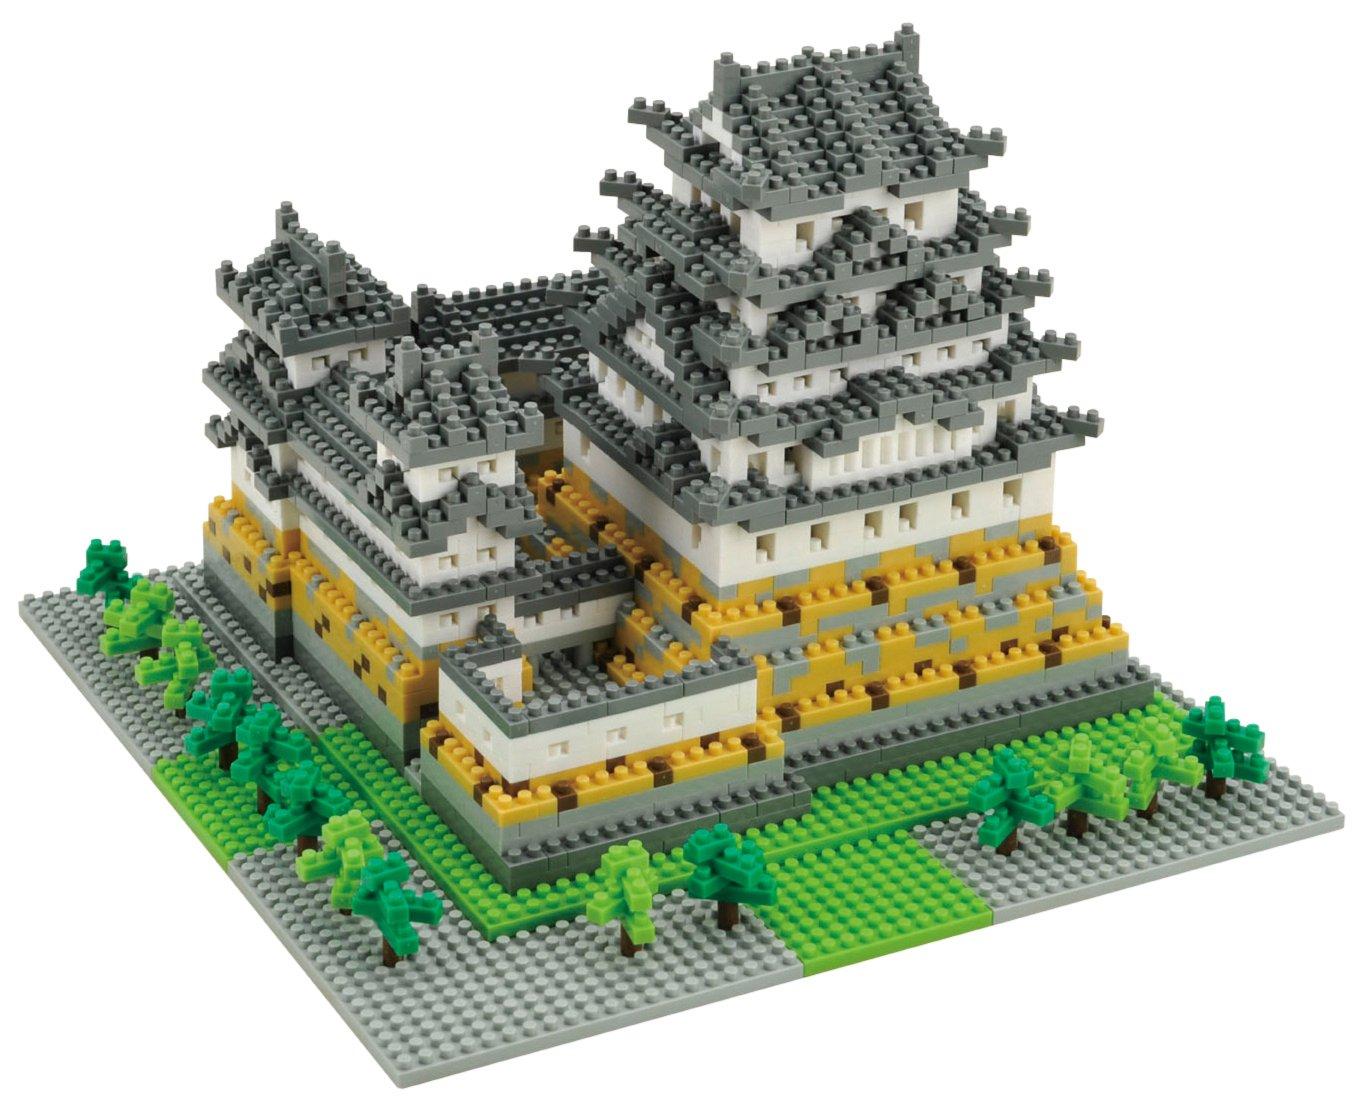 Nanoblock Deluxe Castle Himeji Ohio Art 99016